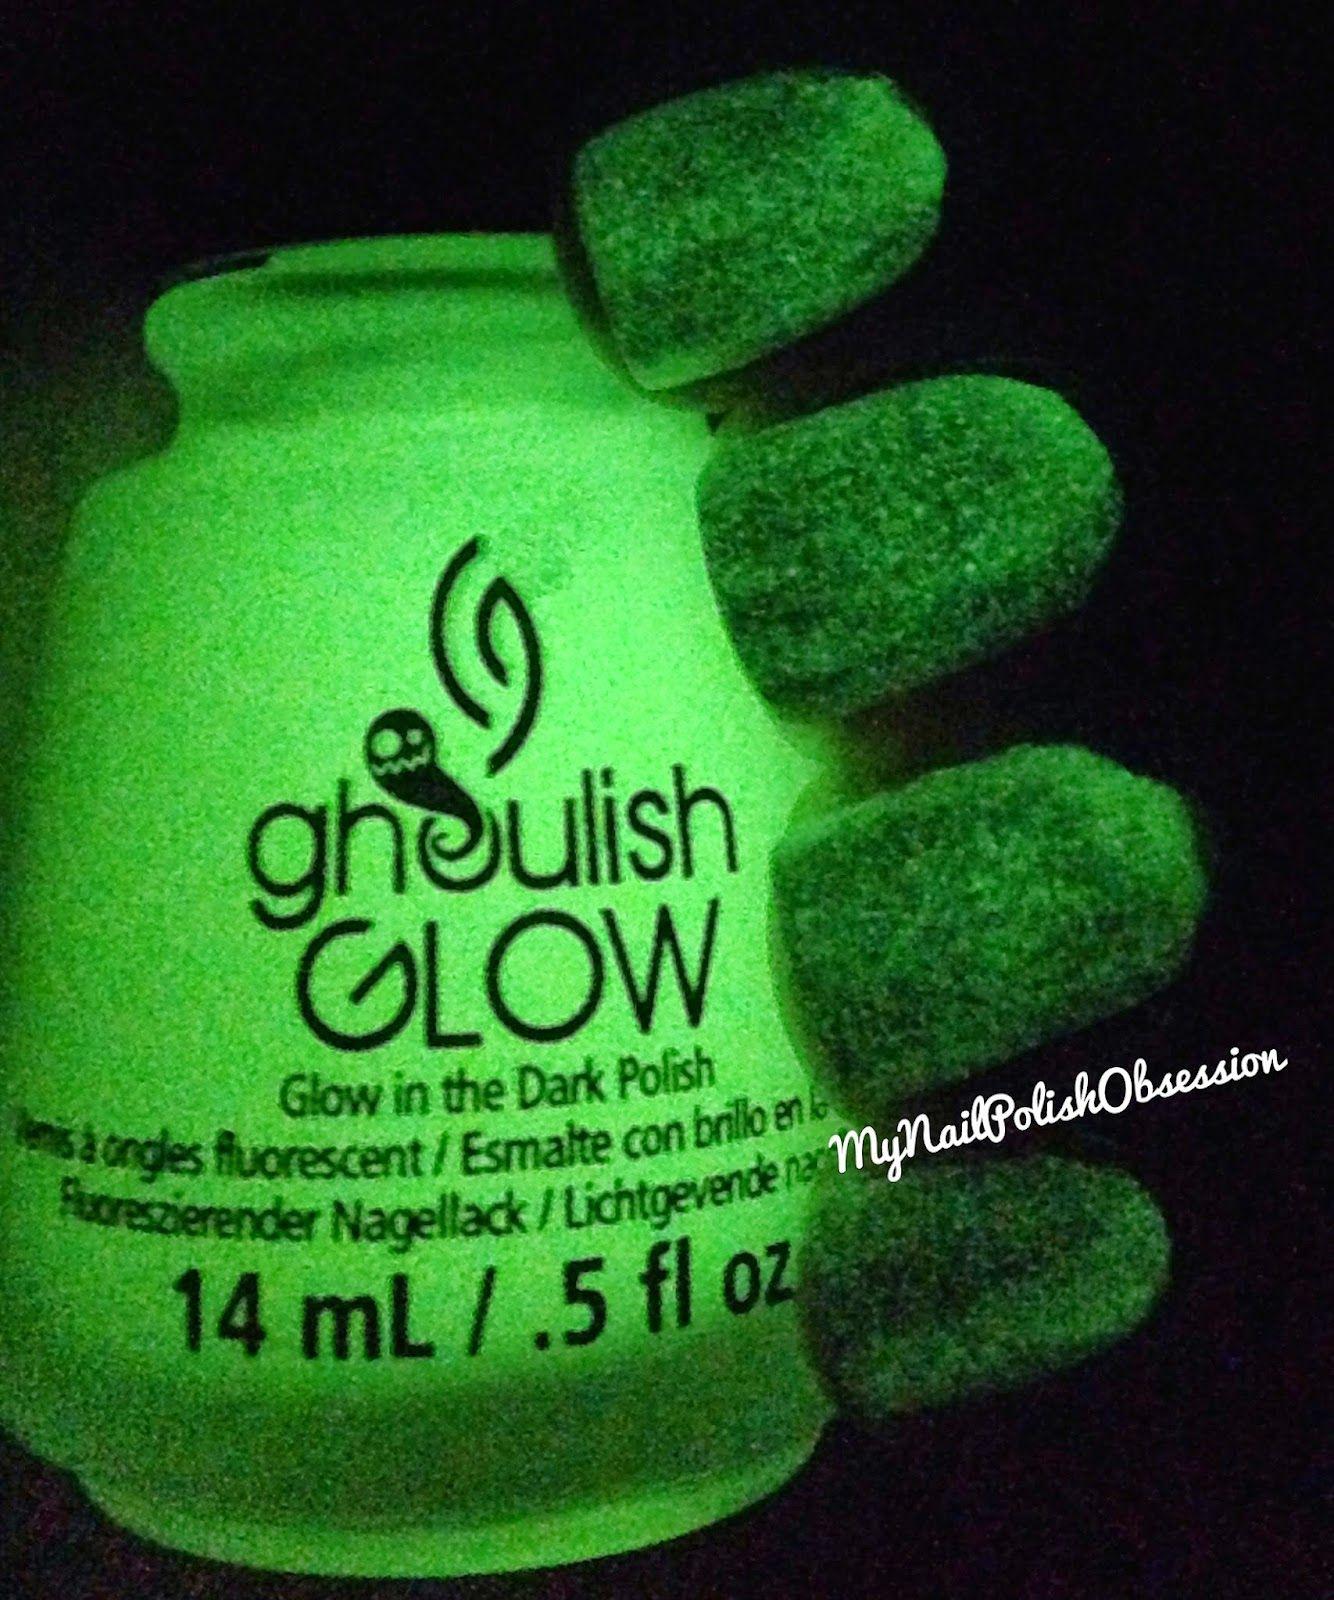 China Glaze Ghoulish Glow | 2012-2014 My Nail Polish Obsession ...